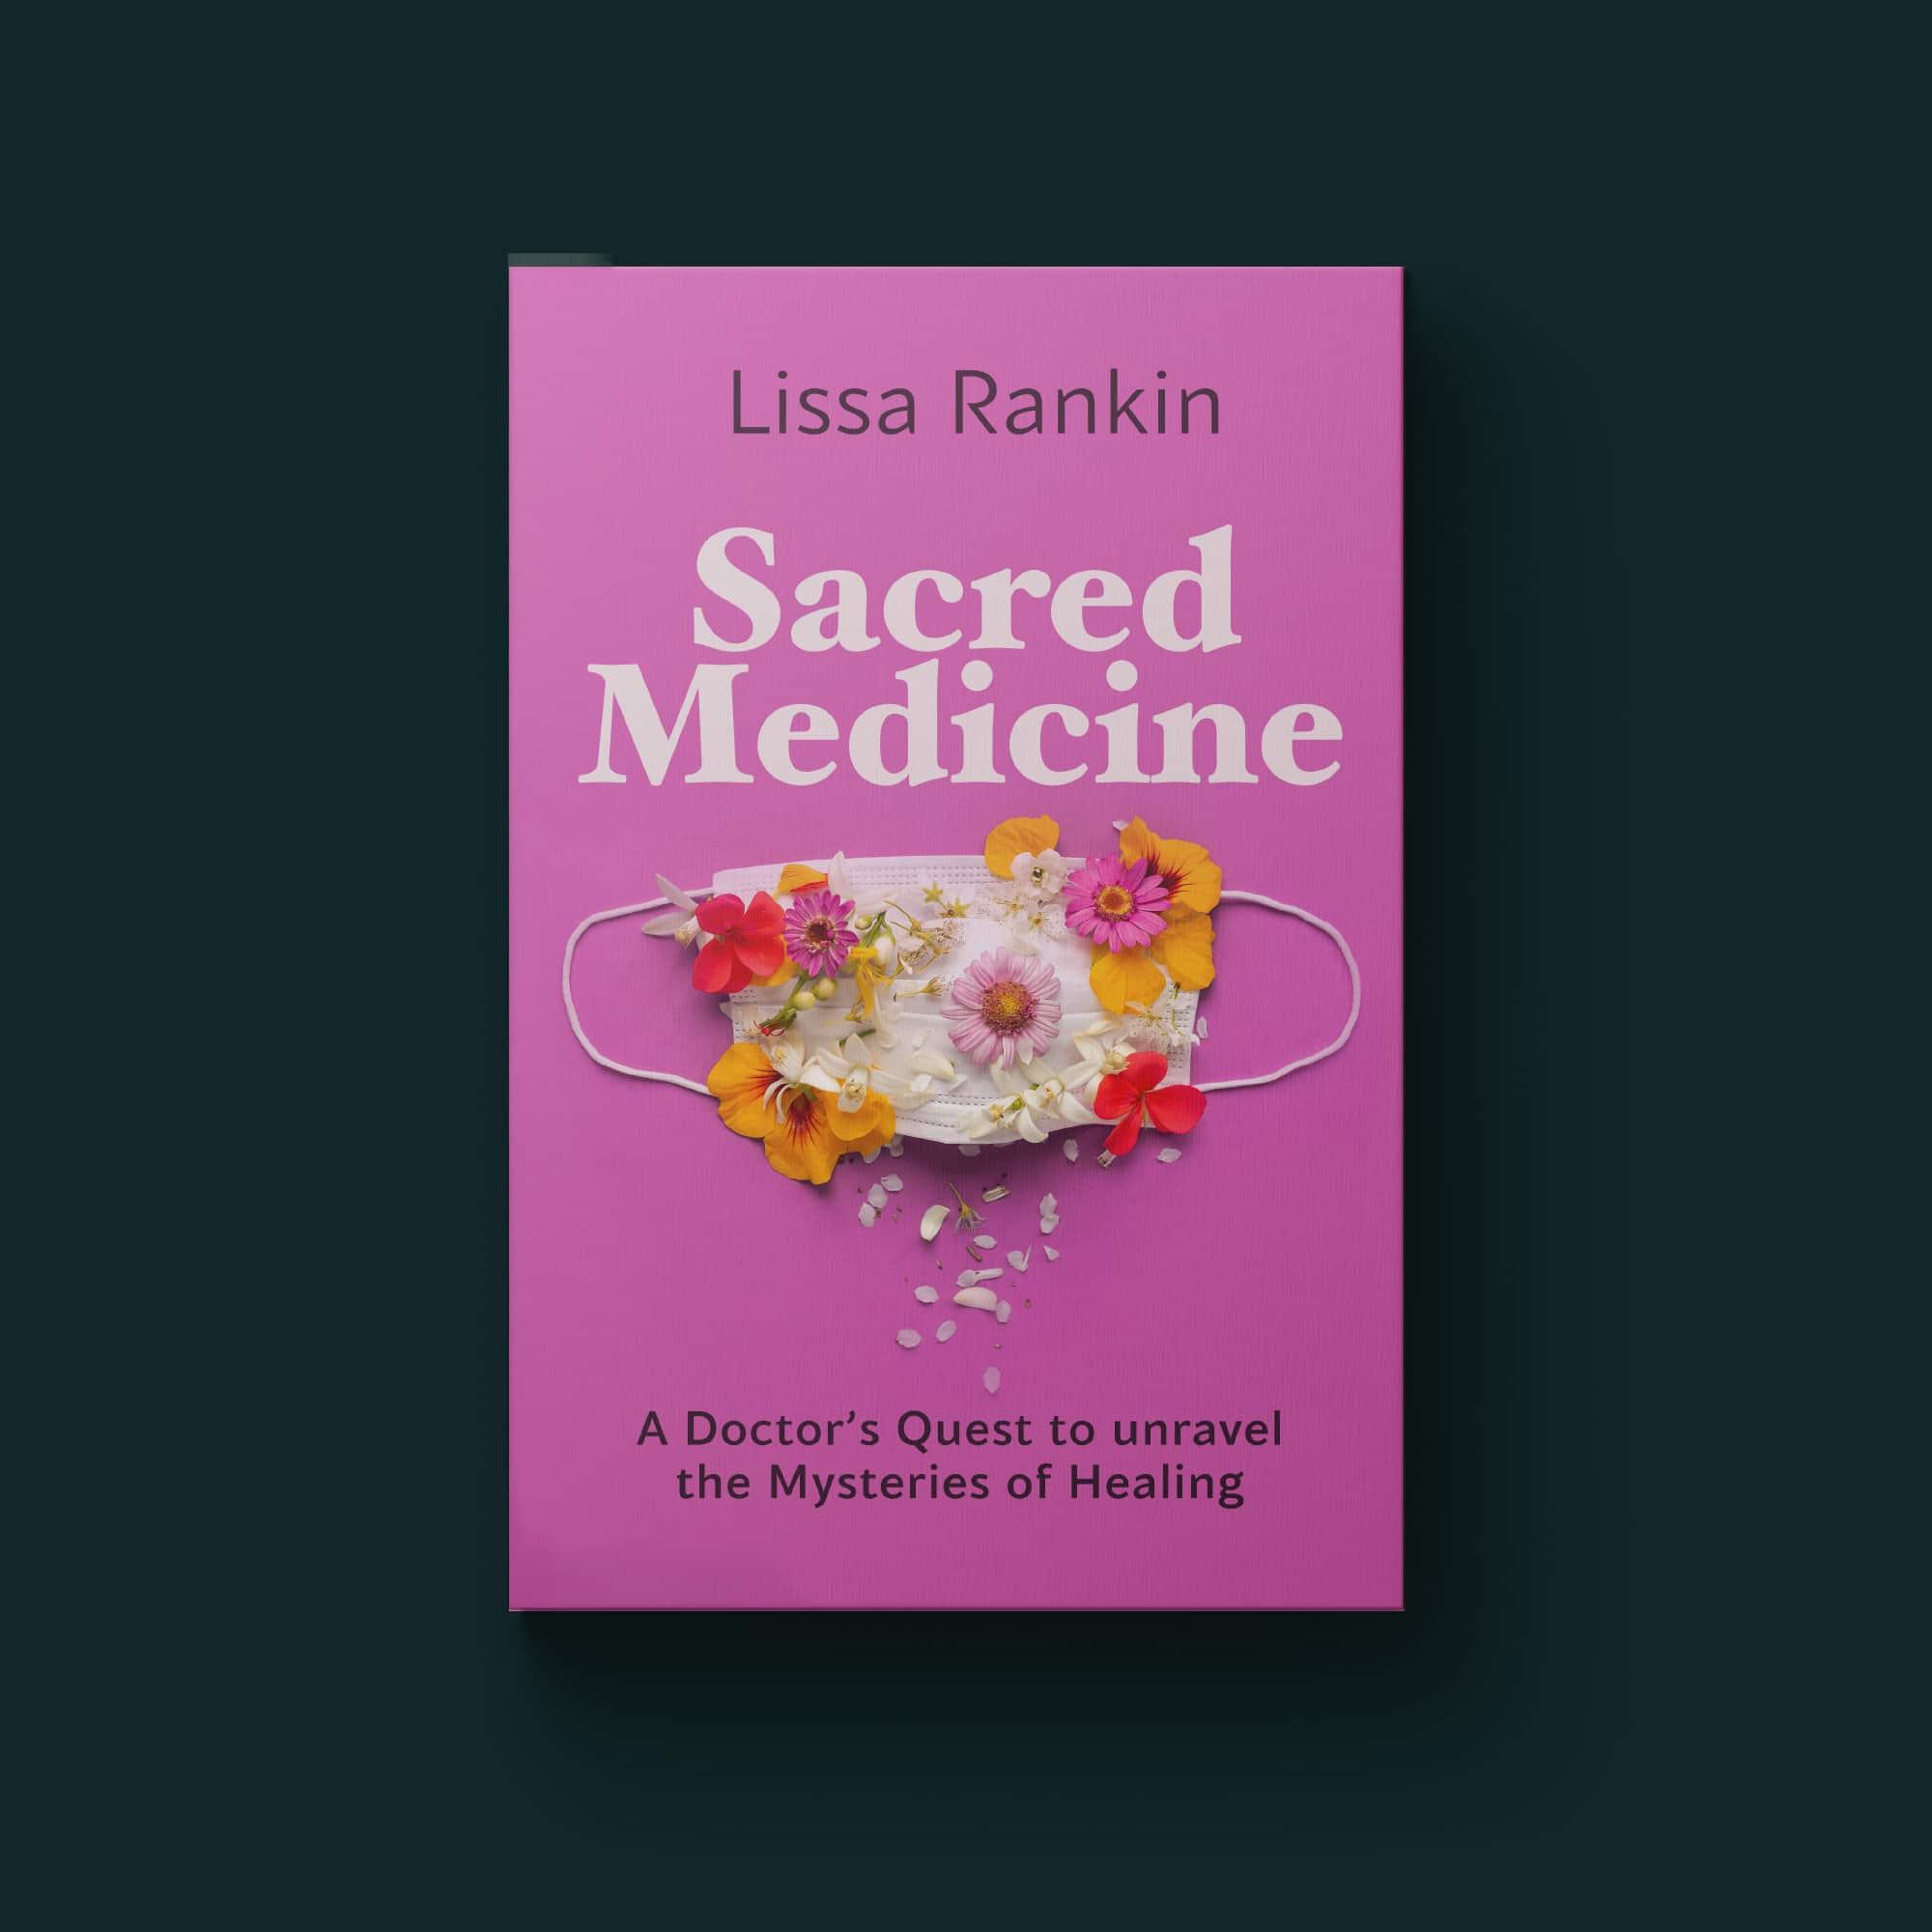 sacred-medicine-cover-concept-4